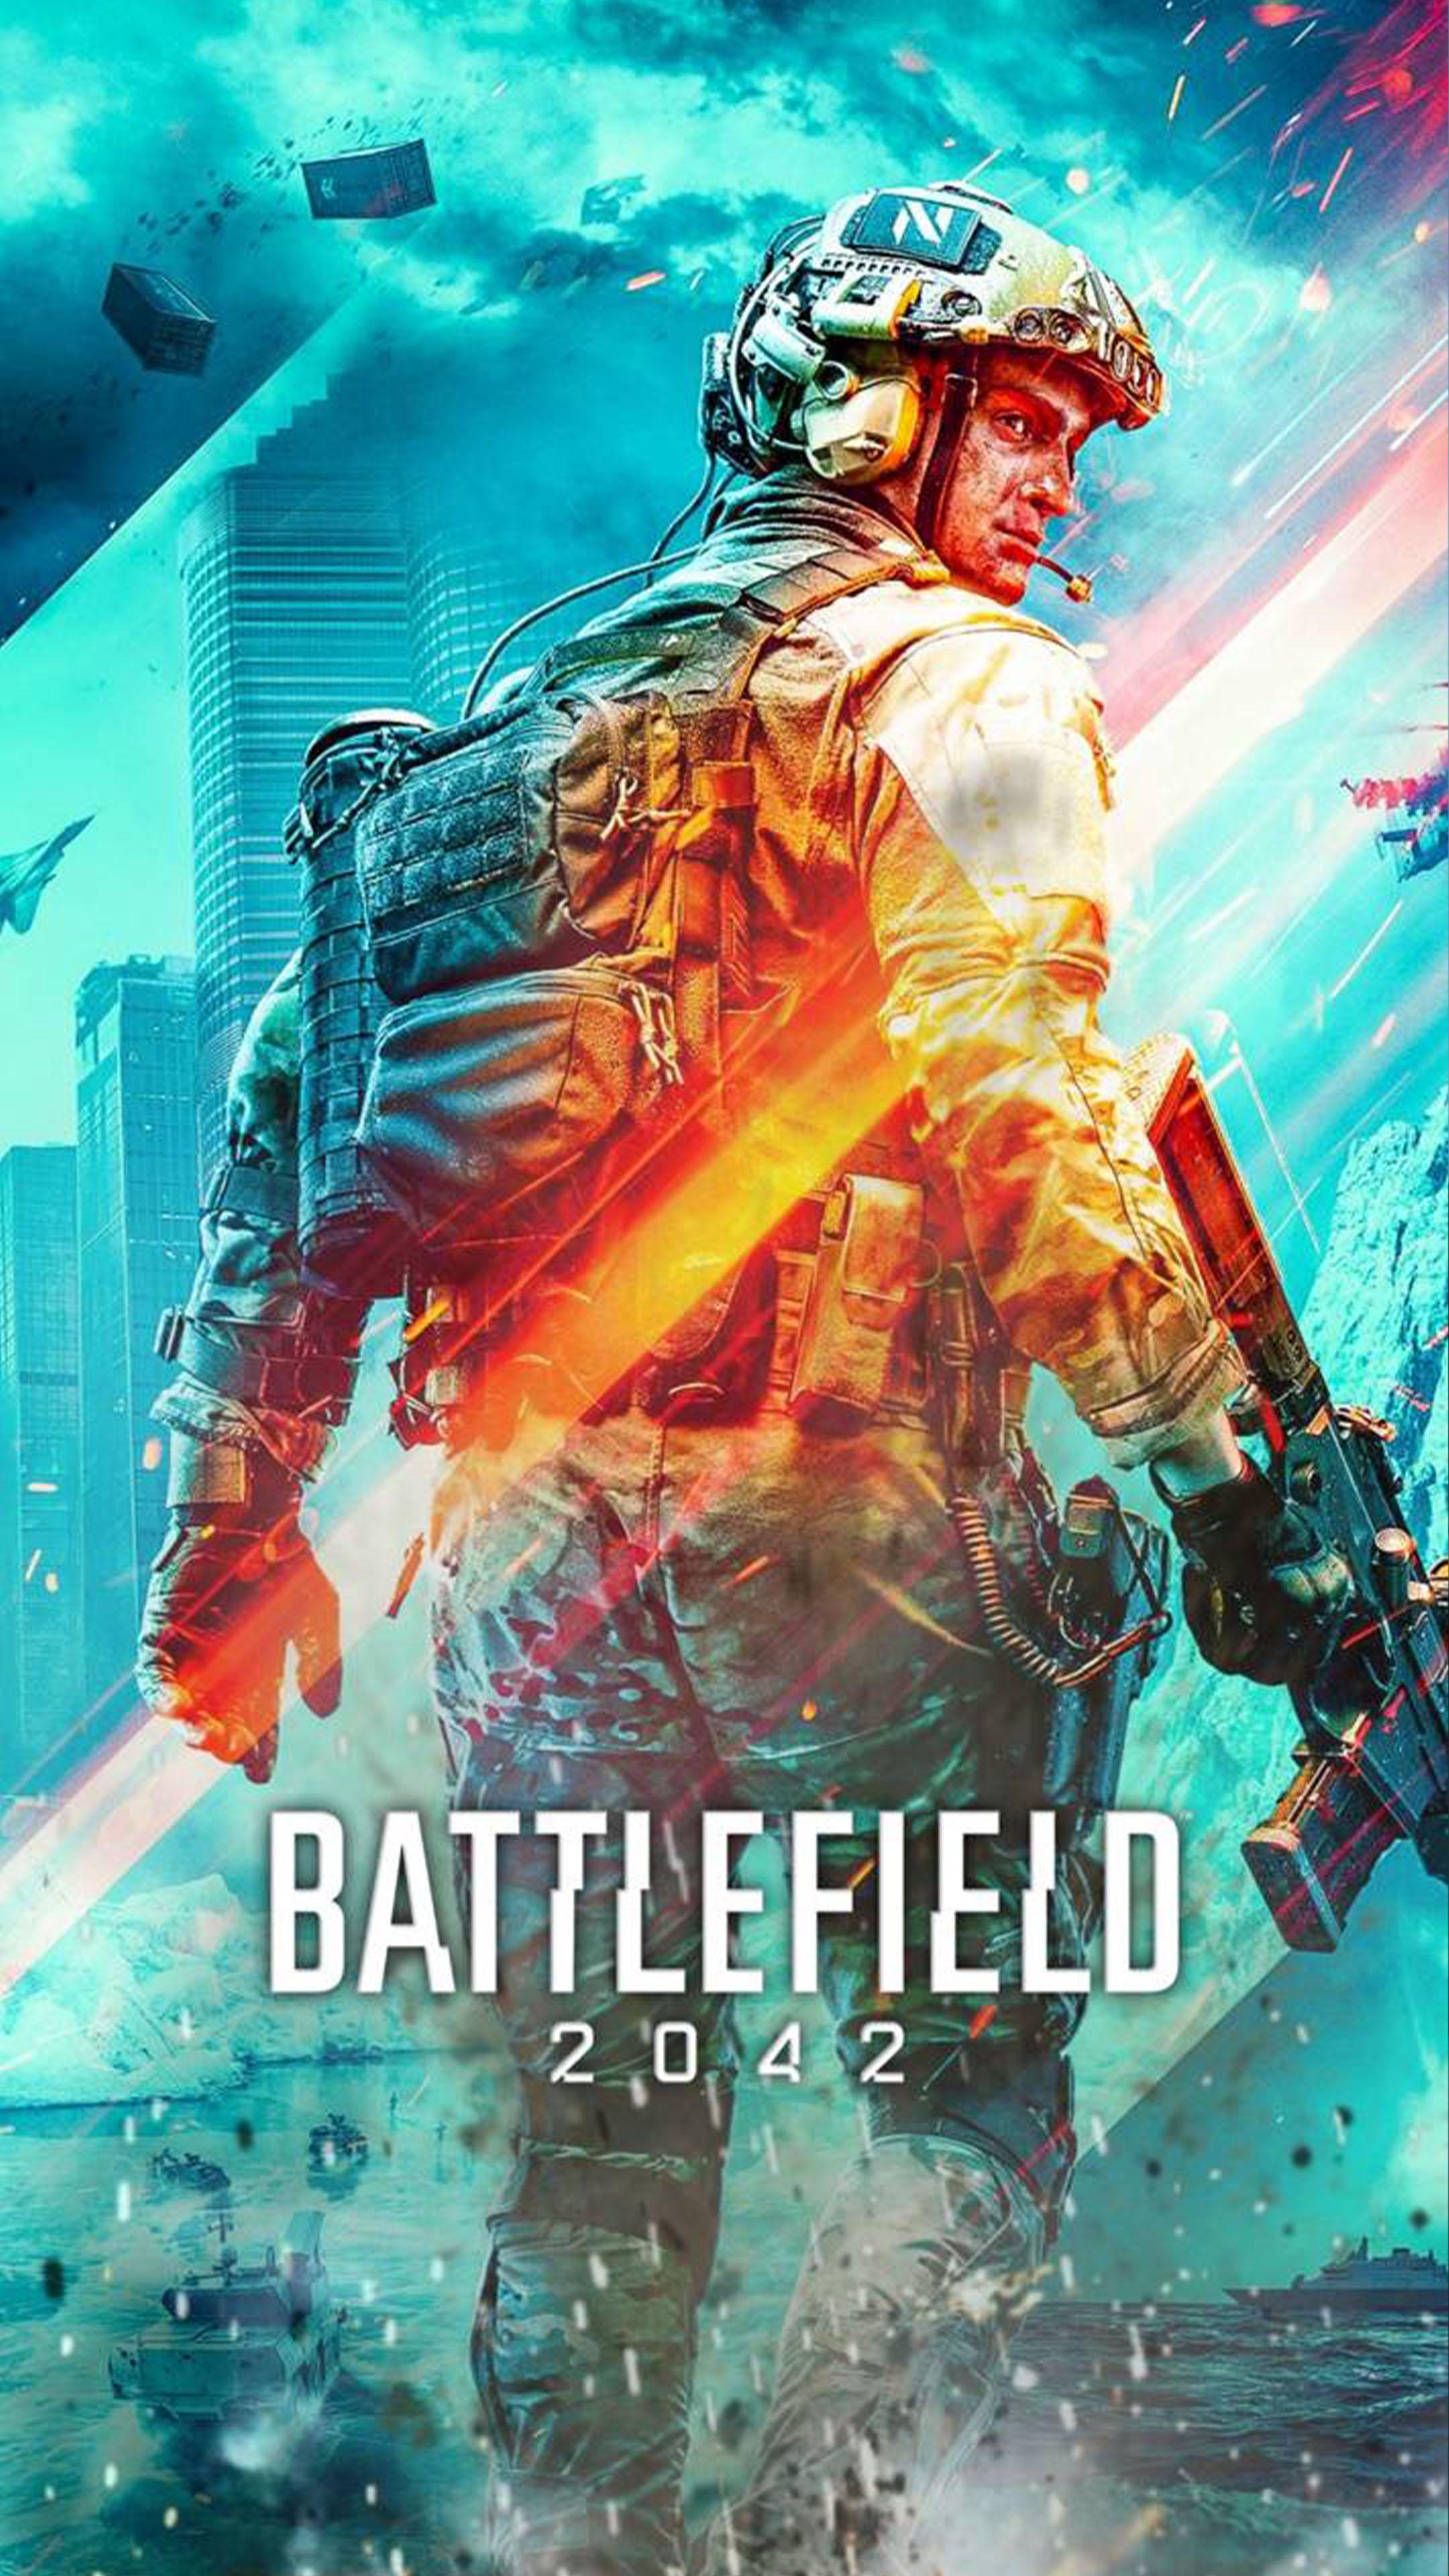 Battlefield 2042 Game Poster 4K Ultra HD Mobile Wallpaper 2160x3840